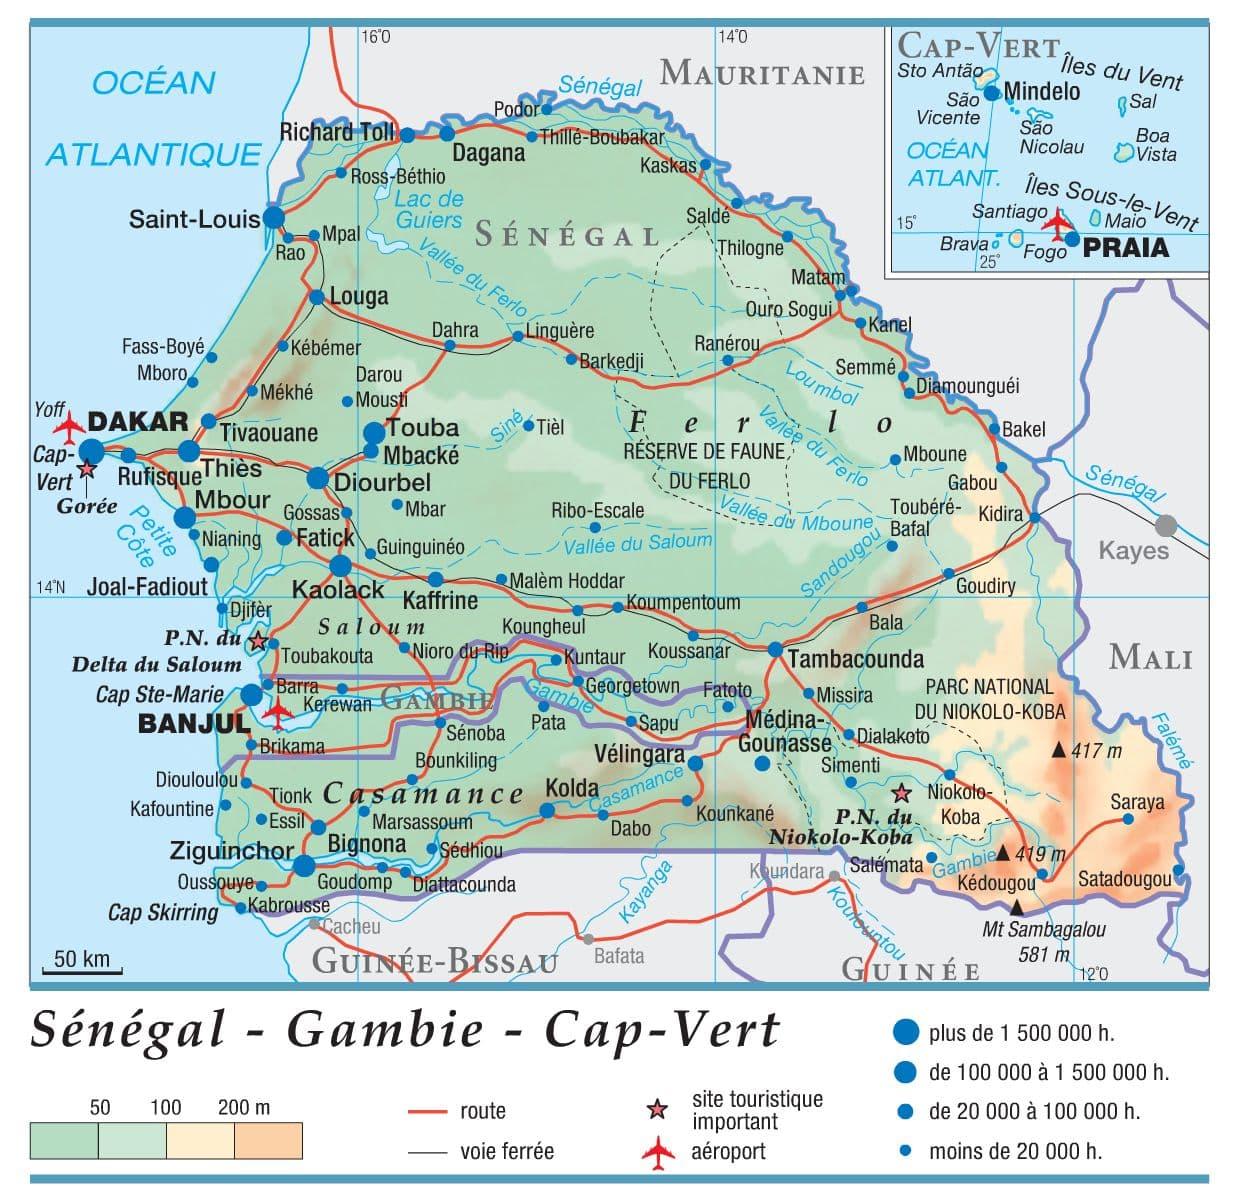 Carte Senegal Cap Vert.Encyclopedie Larousse En Ligne Senegal Gambie Cap Vert